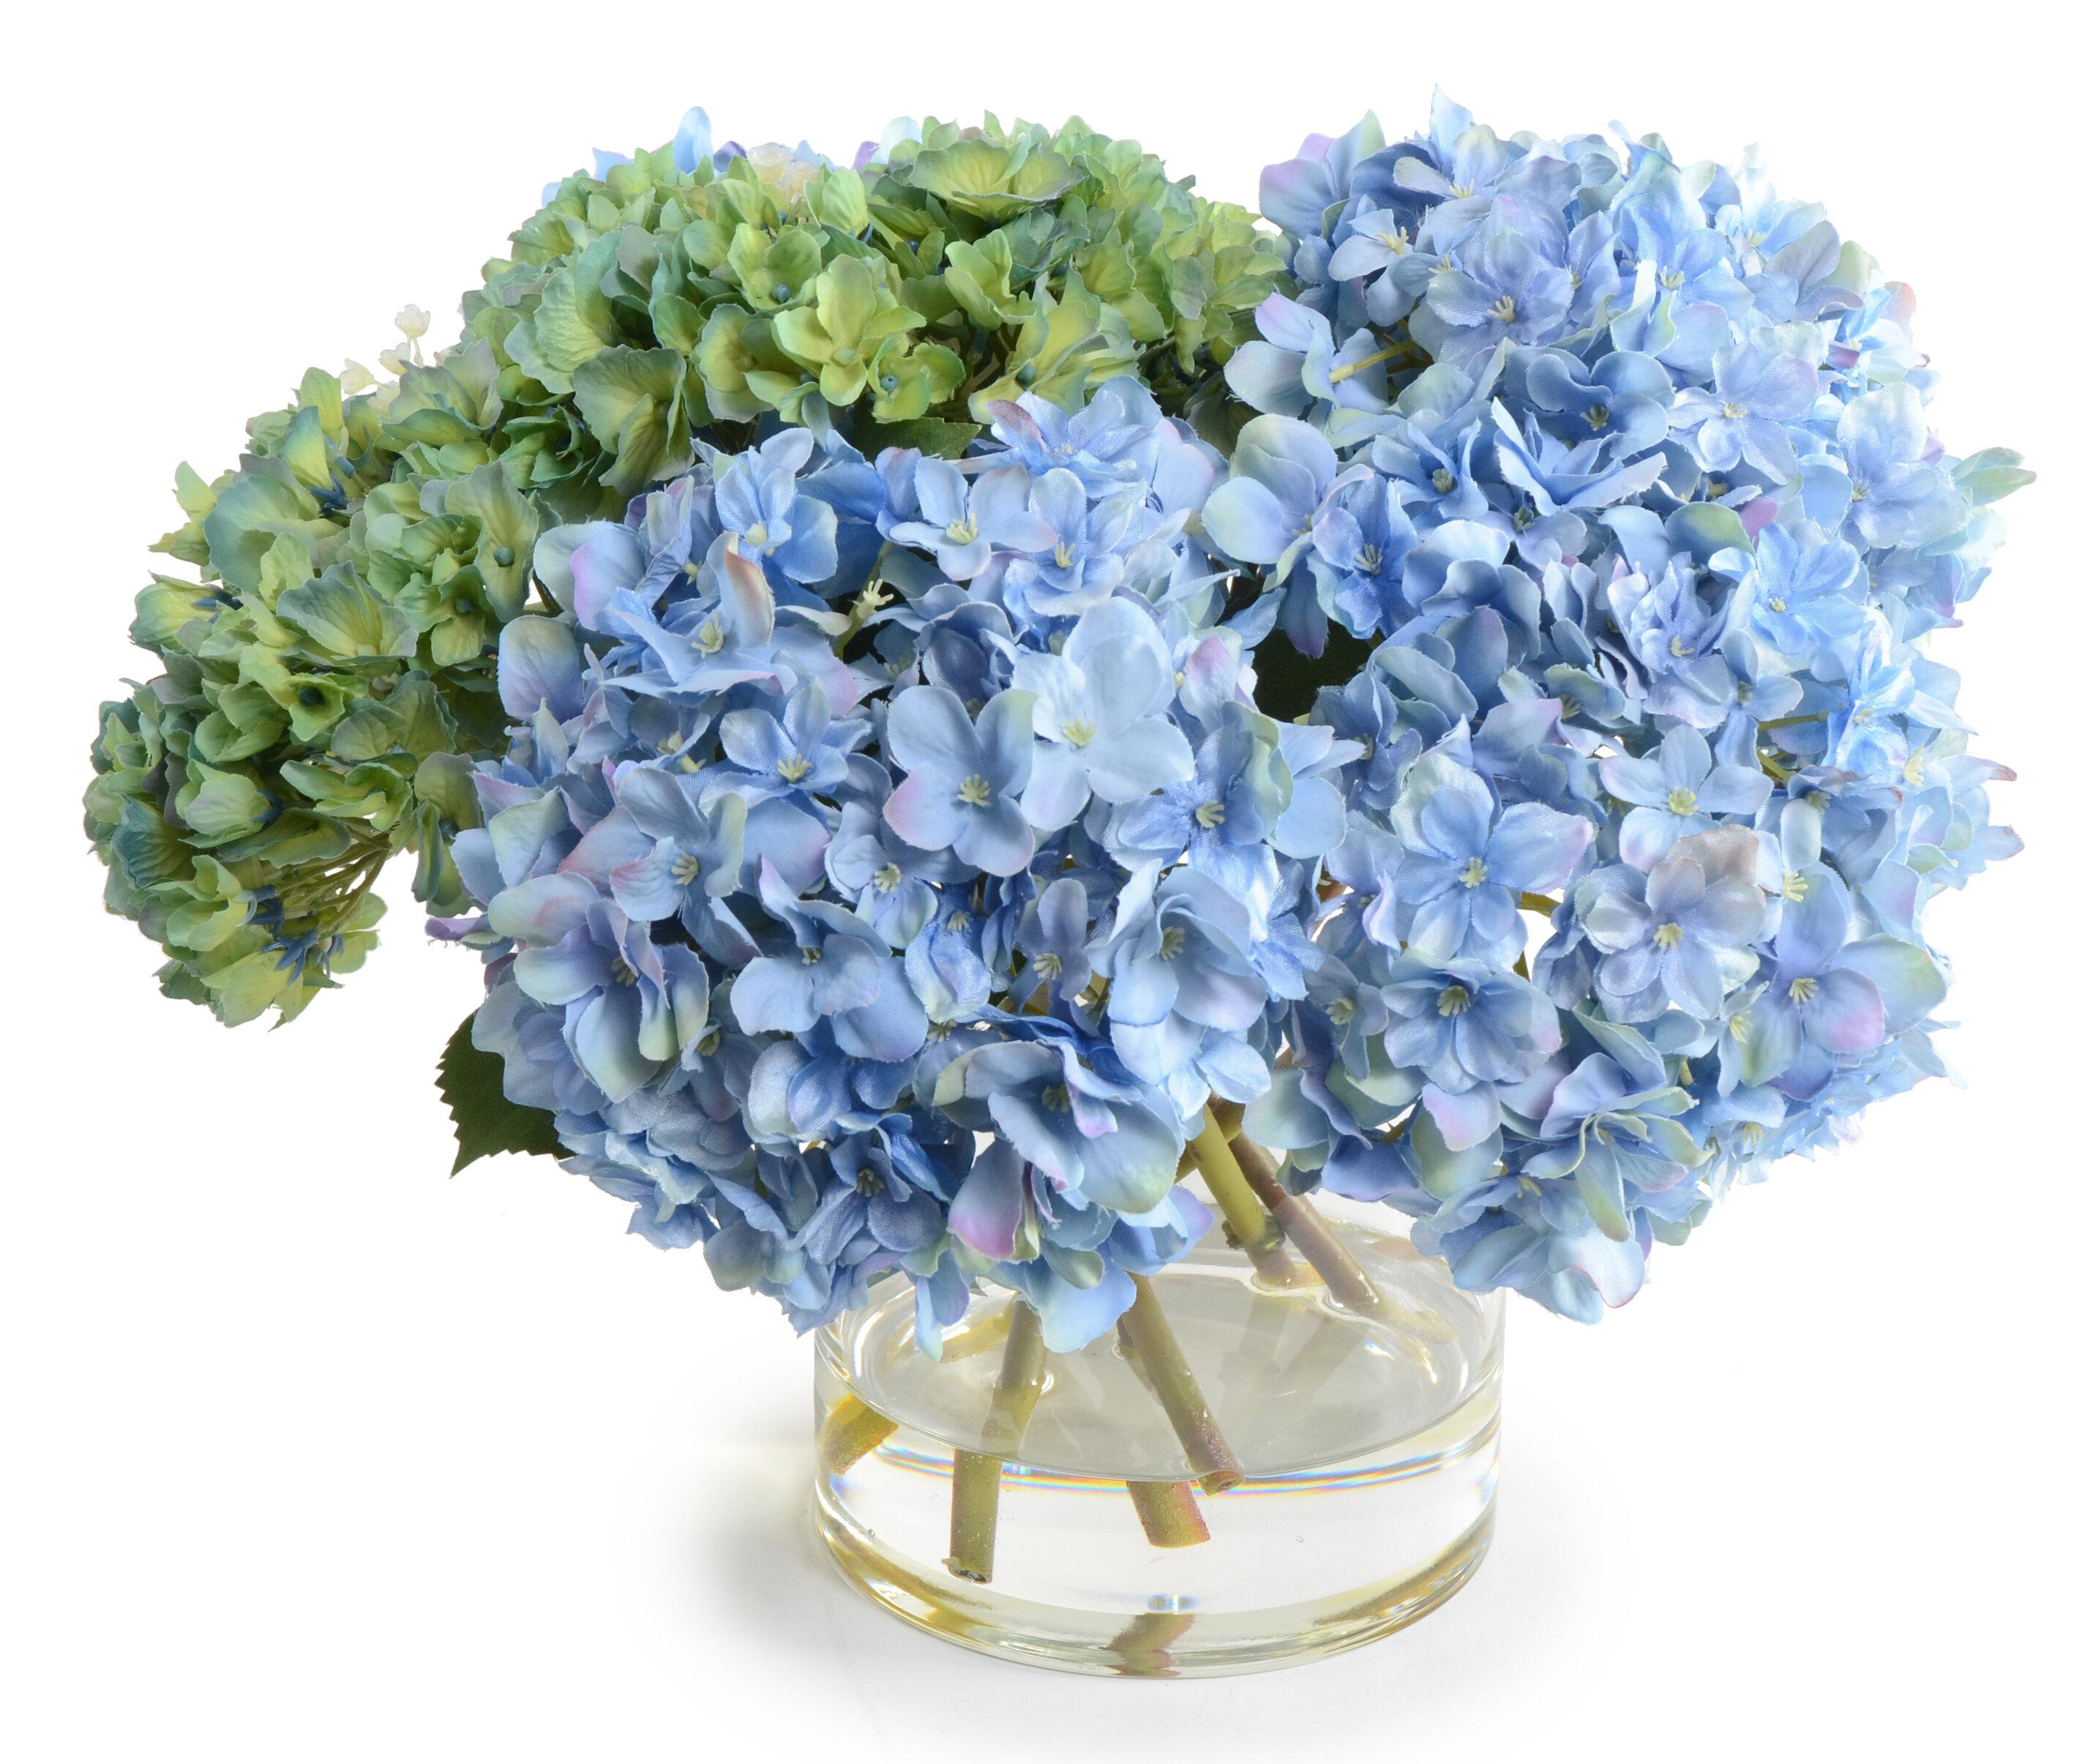 New Growth Designs Faux Hydrangea Floral Arrangement In Vase Wayfair